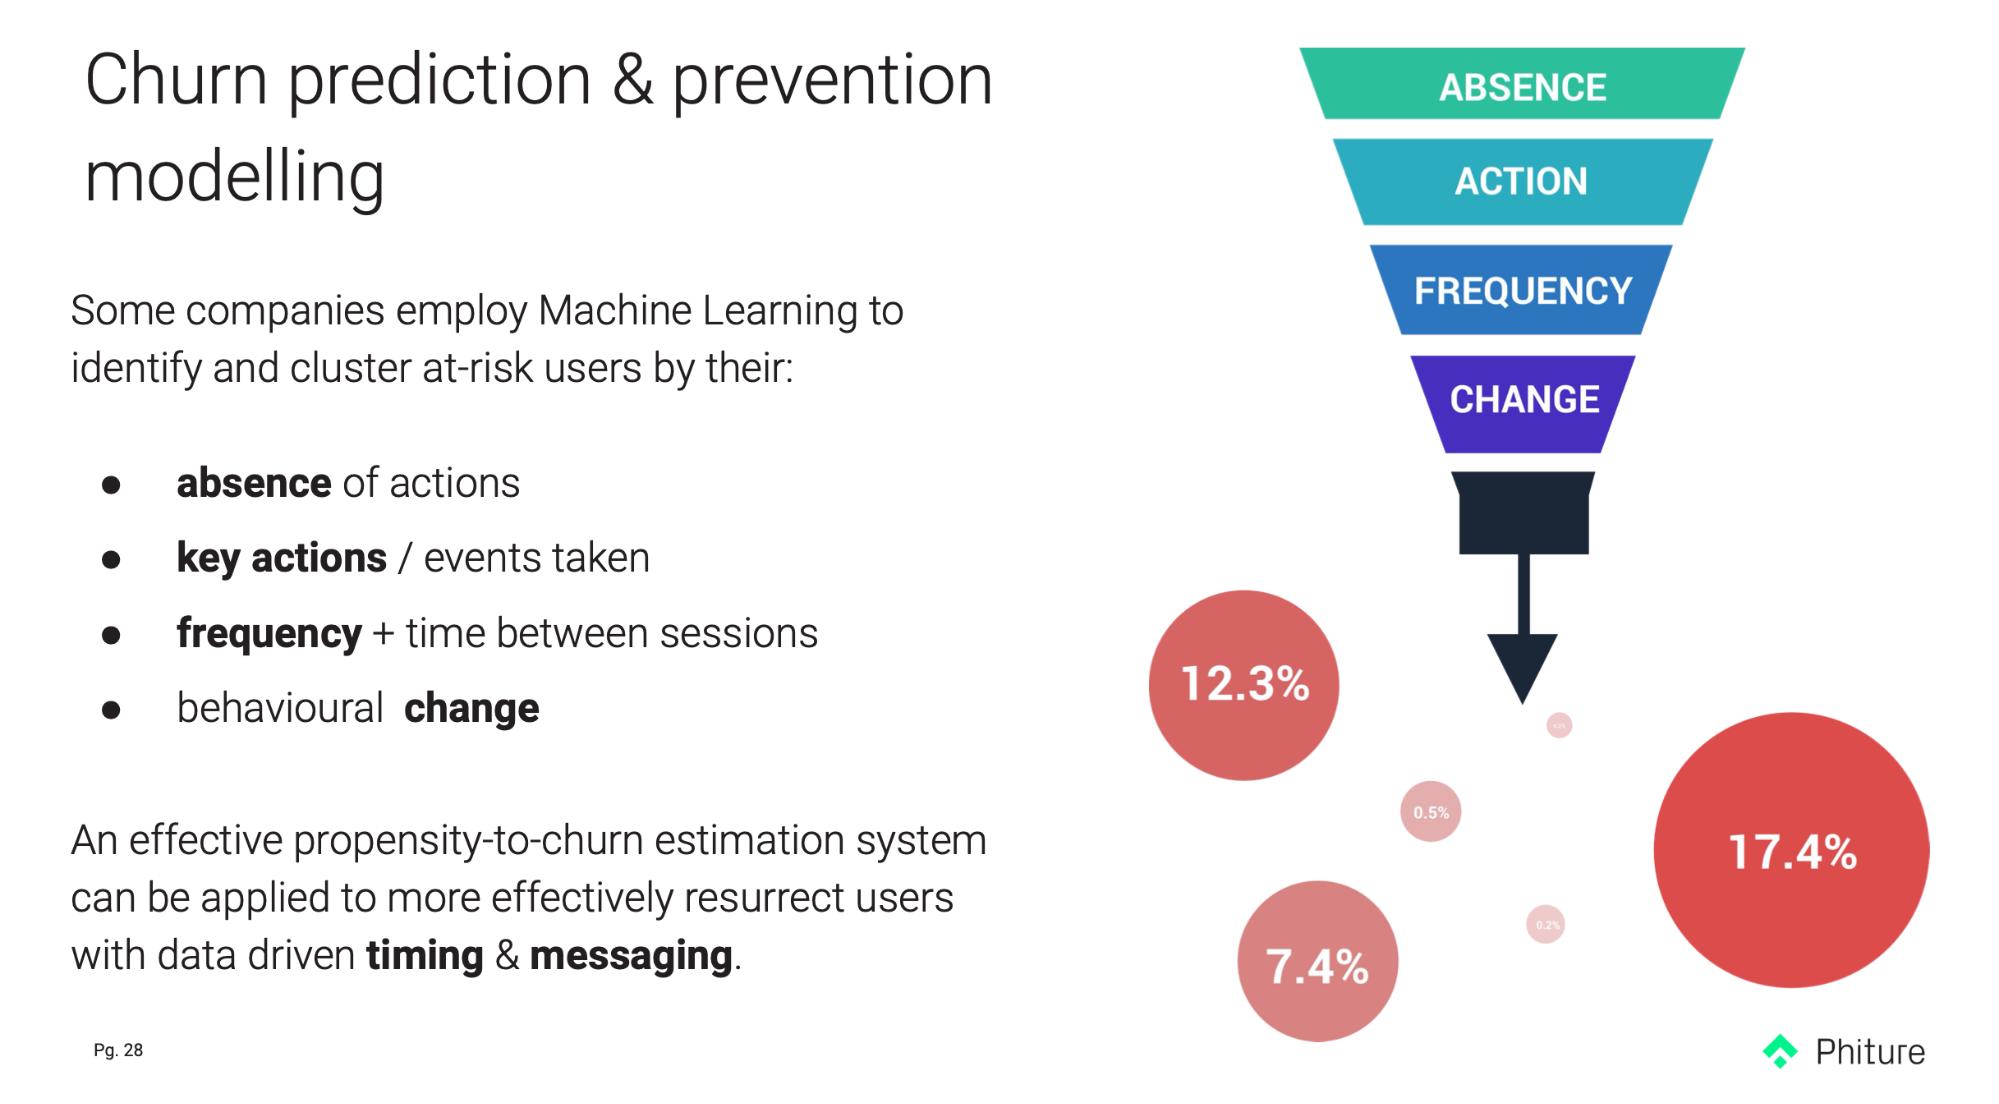 churn prediction & prevention modelling